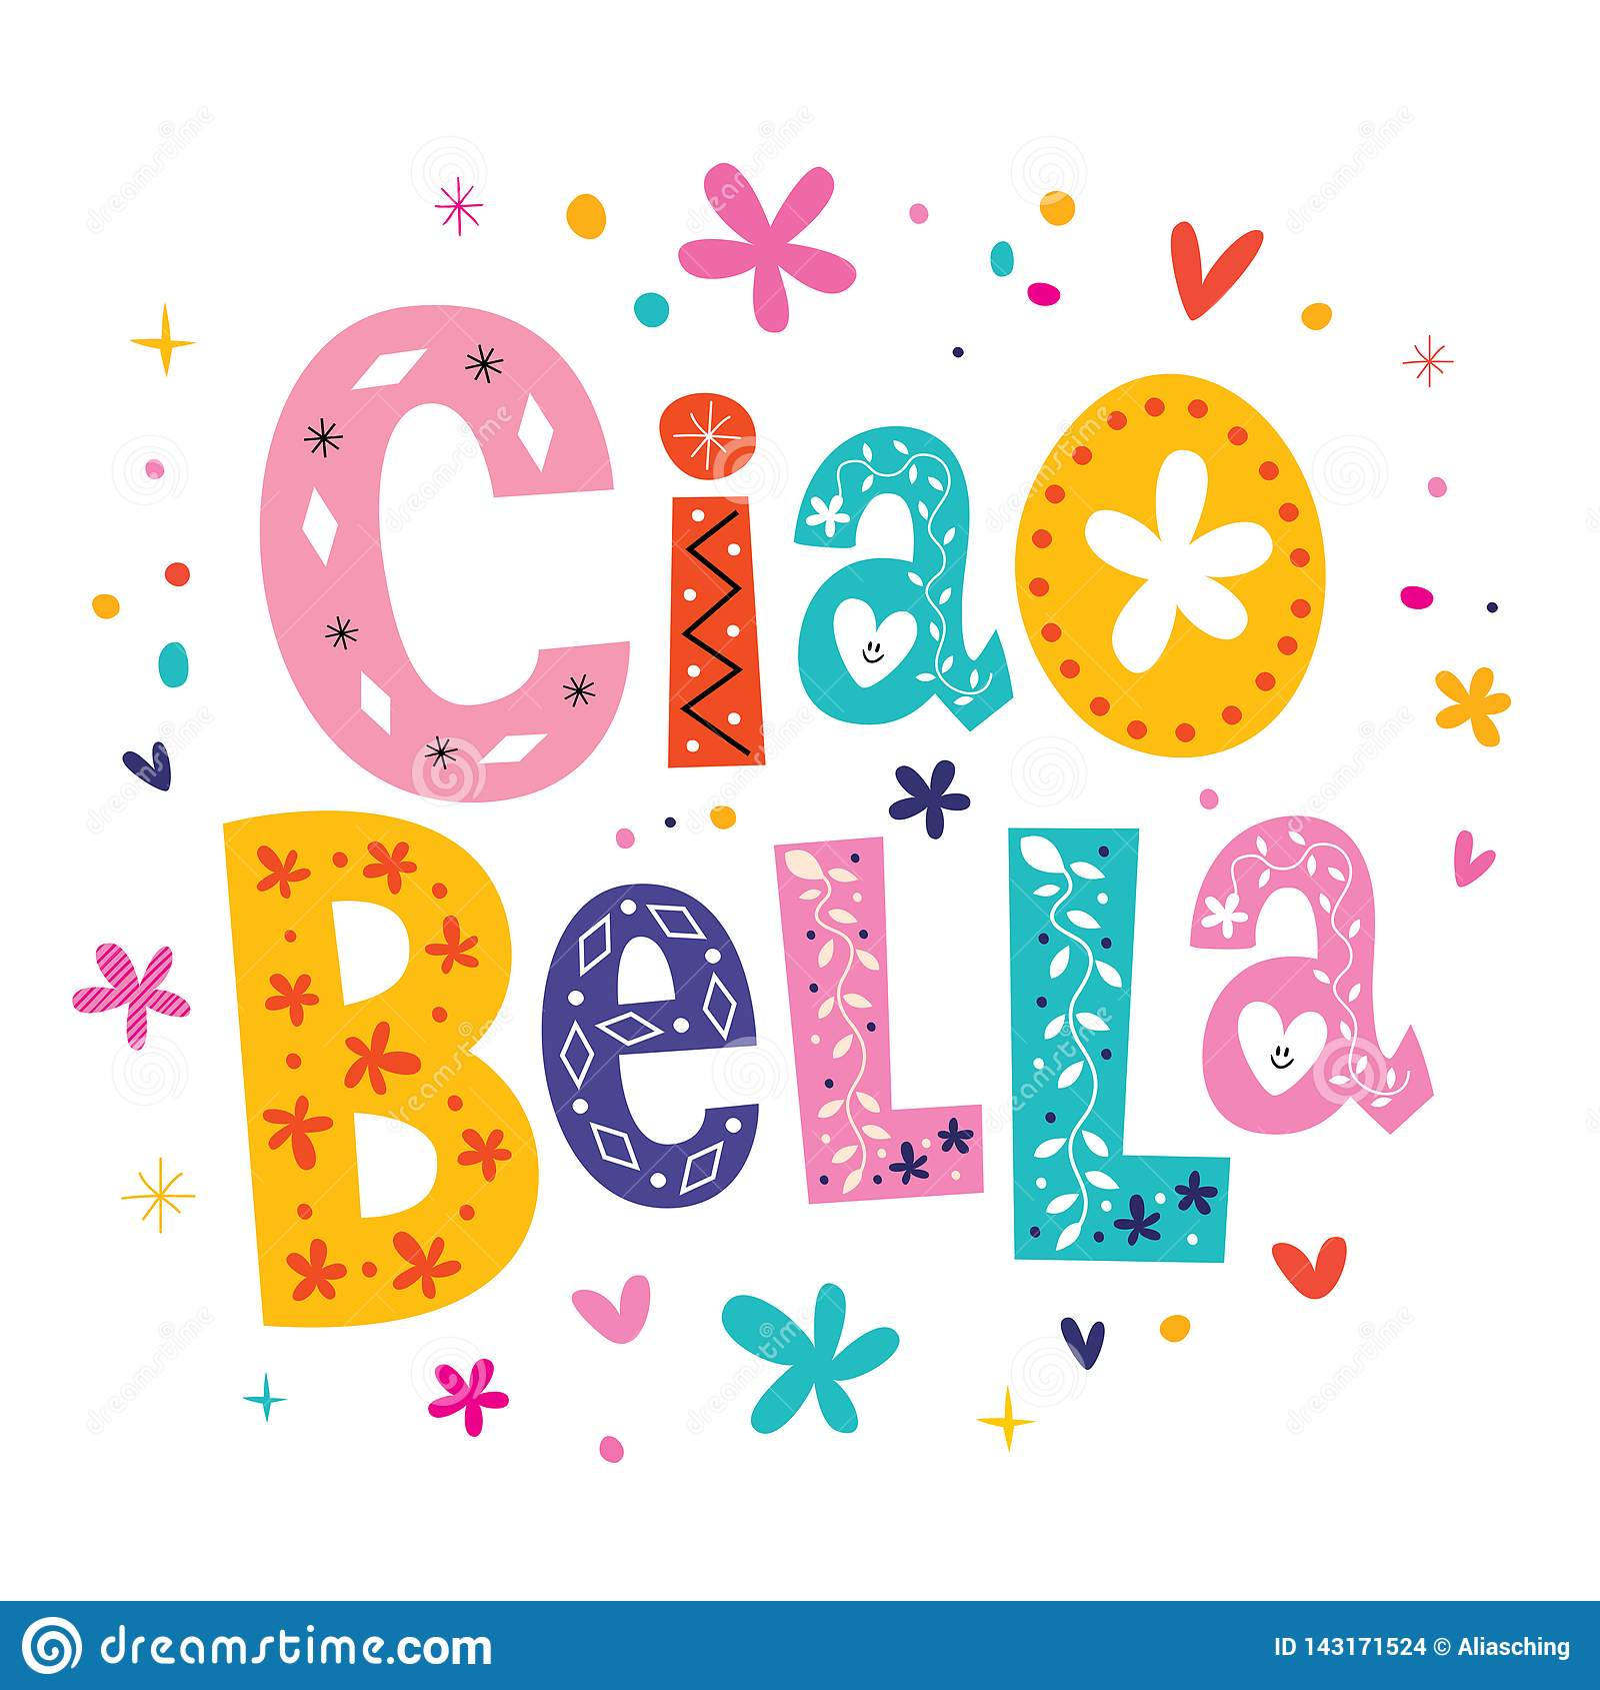 https fr dreamstime com ciao bella hello beautiful en italien conception d inscription unique image143171524